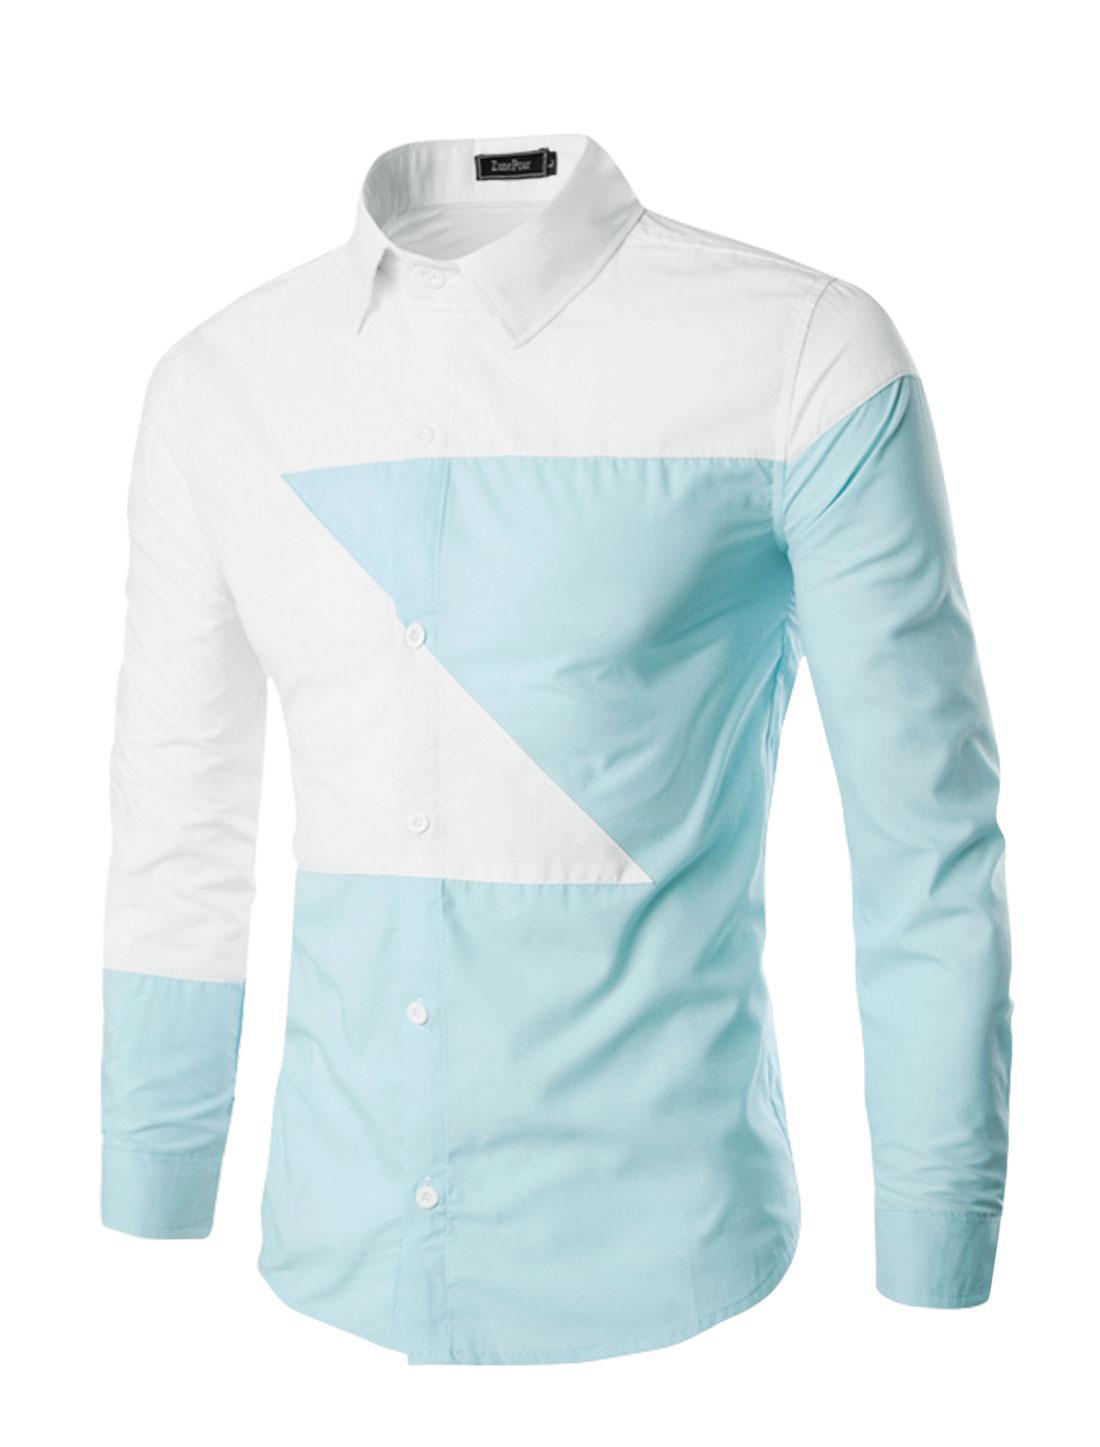 Men Long Sleeves Contrast Color Button Up Slim Fit Shirt Blue M